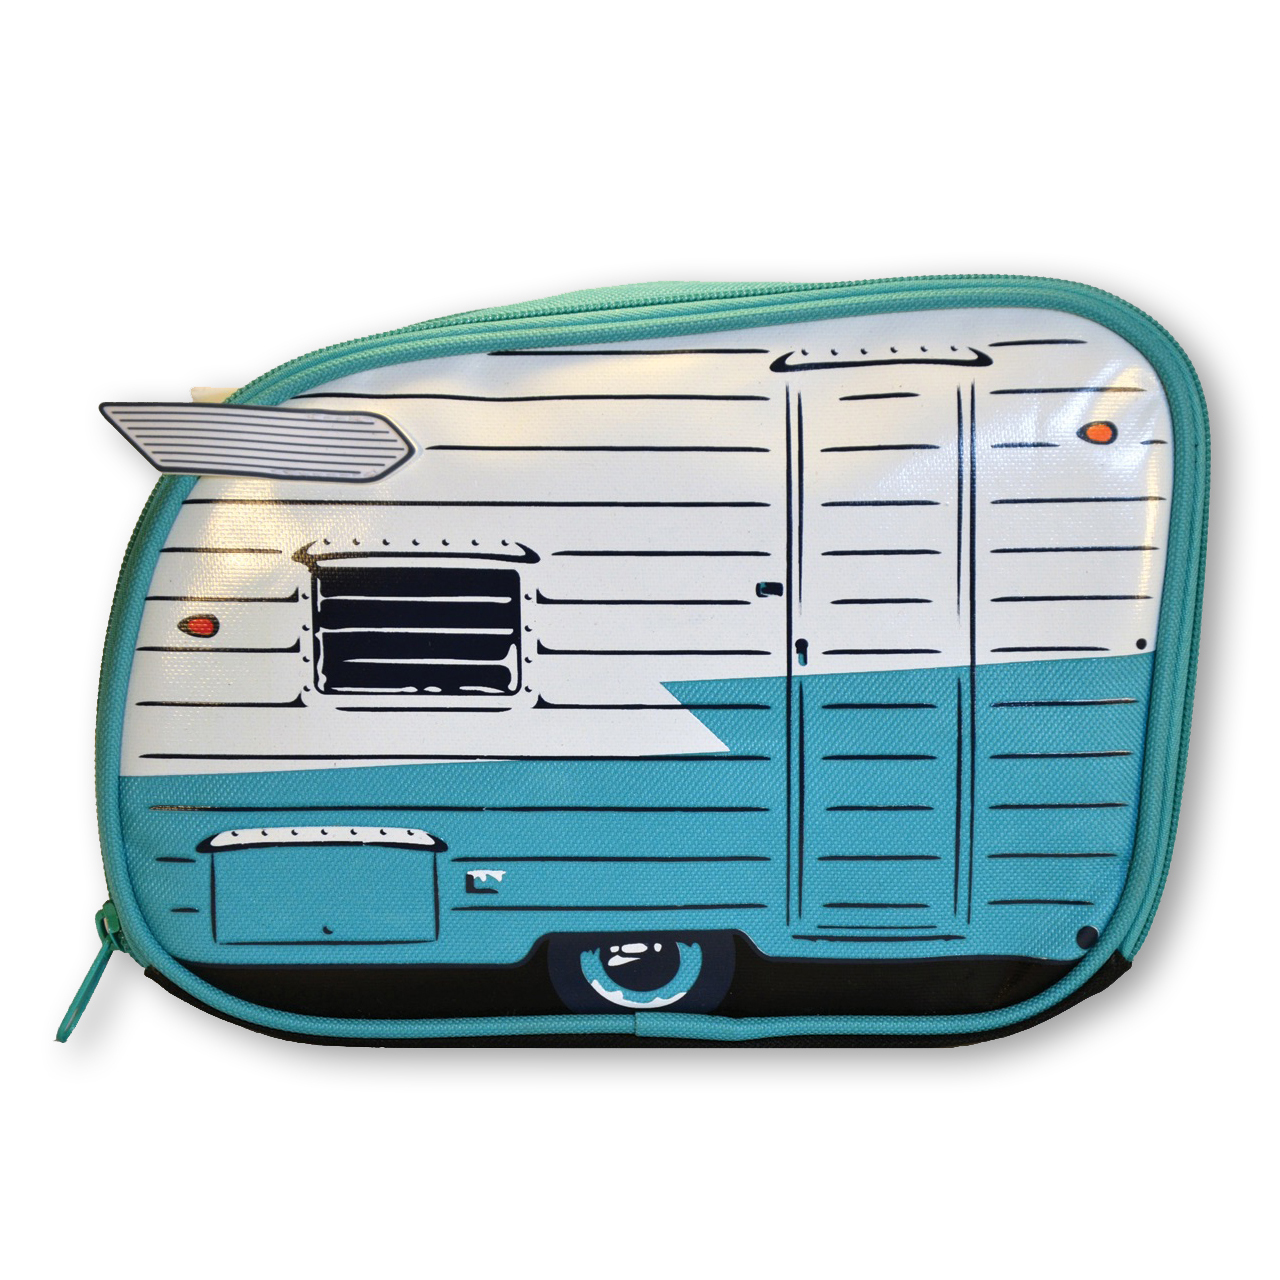 Mint/white teardrop caravan toiletry bag | The Design Gift Shop